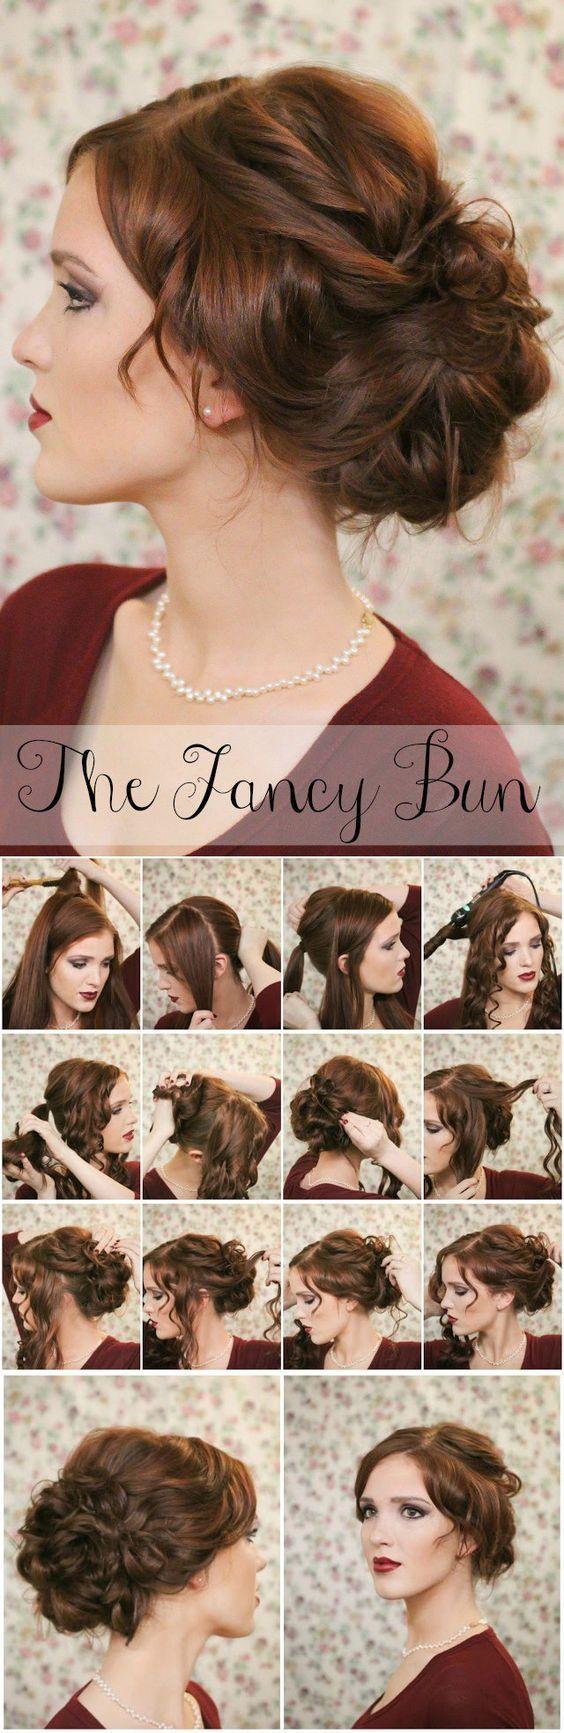 the+fancy+bun+diy+hairstyle+http://imgsnpics.com/the-fancy-bun-diy-hairstyle/